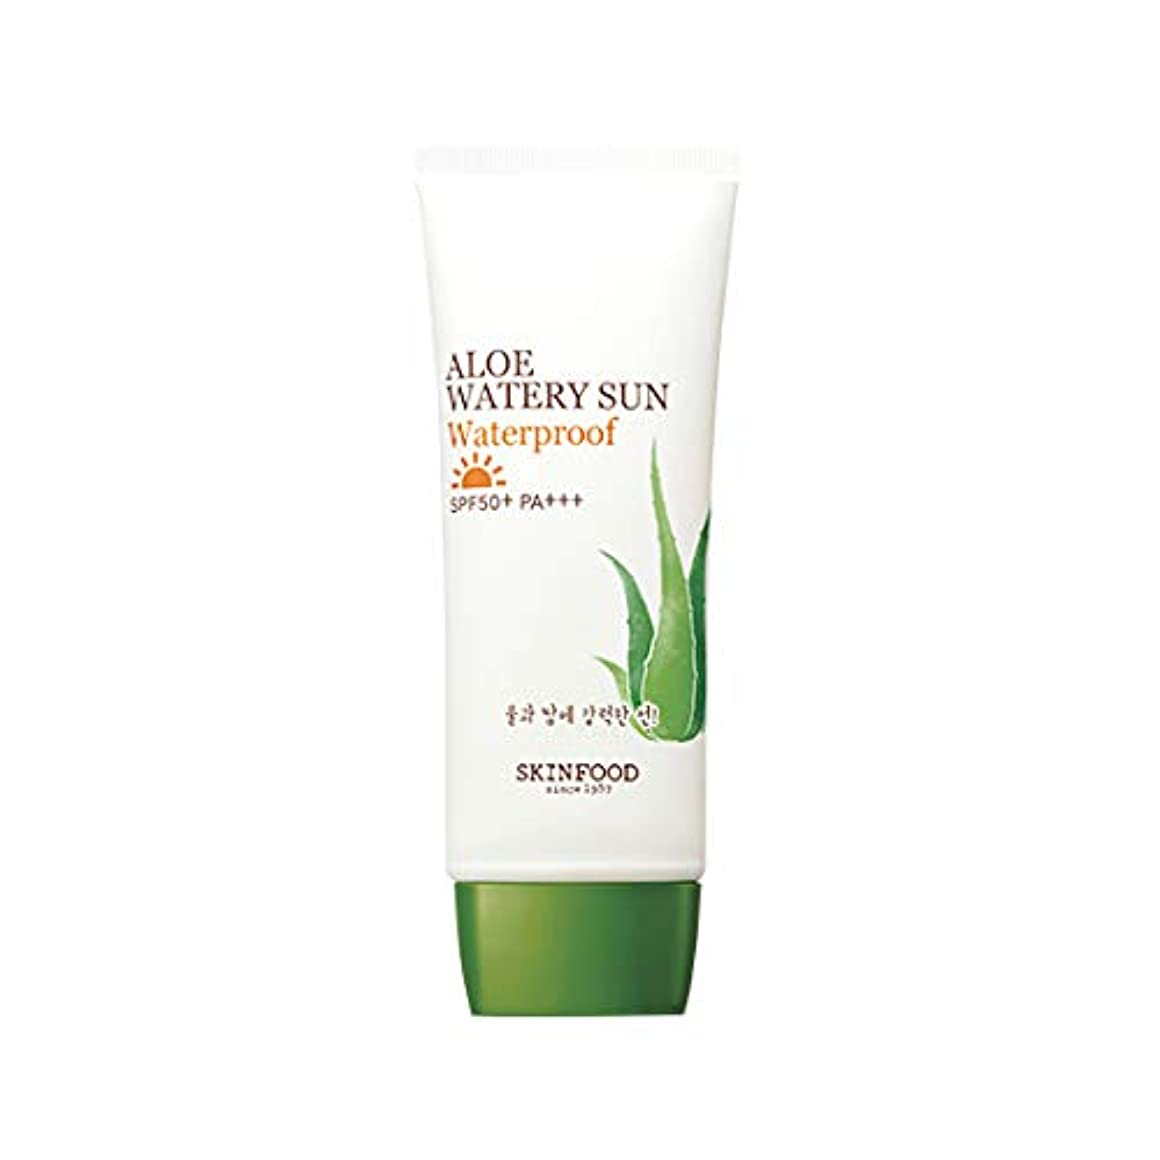 Skinfood アロエウォーターサンプルーフSPF50 + PA +++ / Aloe Watery Sun Waterproof SPF50+ PA+++ 50ml [並行輸入品]